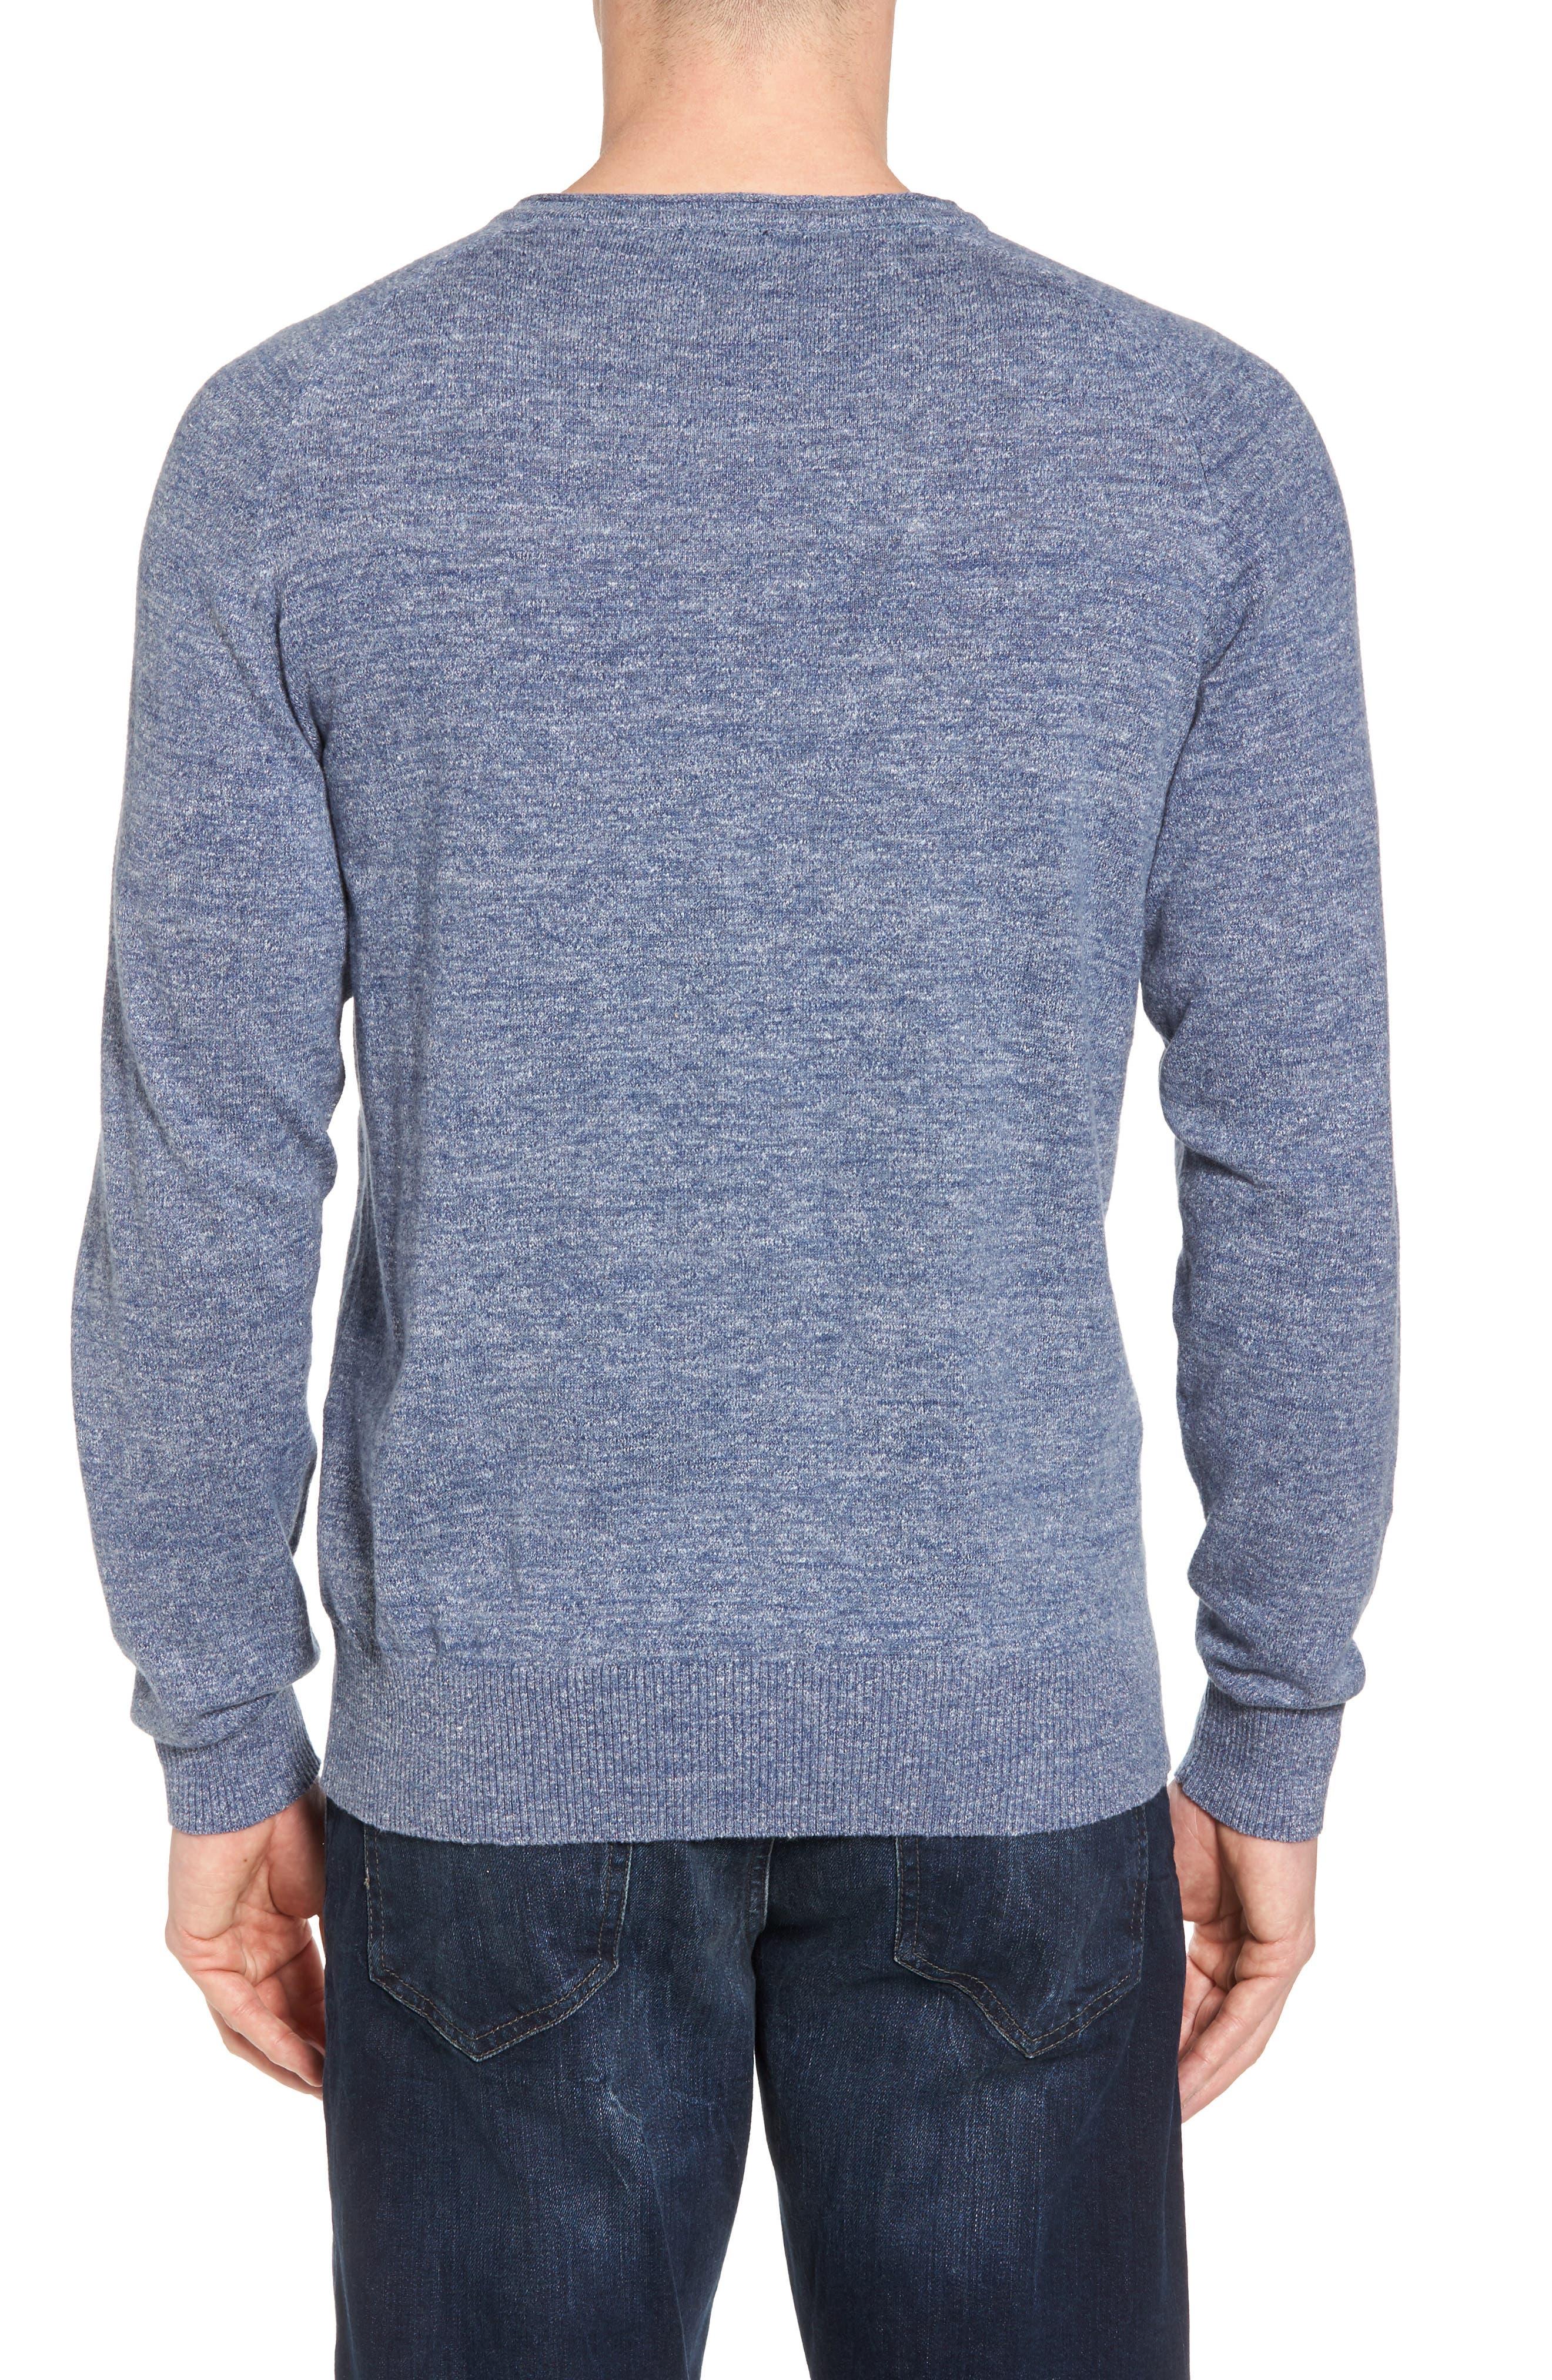 Arbors Cotton V-Neck Sweater,                             Alternate thumbnail 2, color,                             Riviera